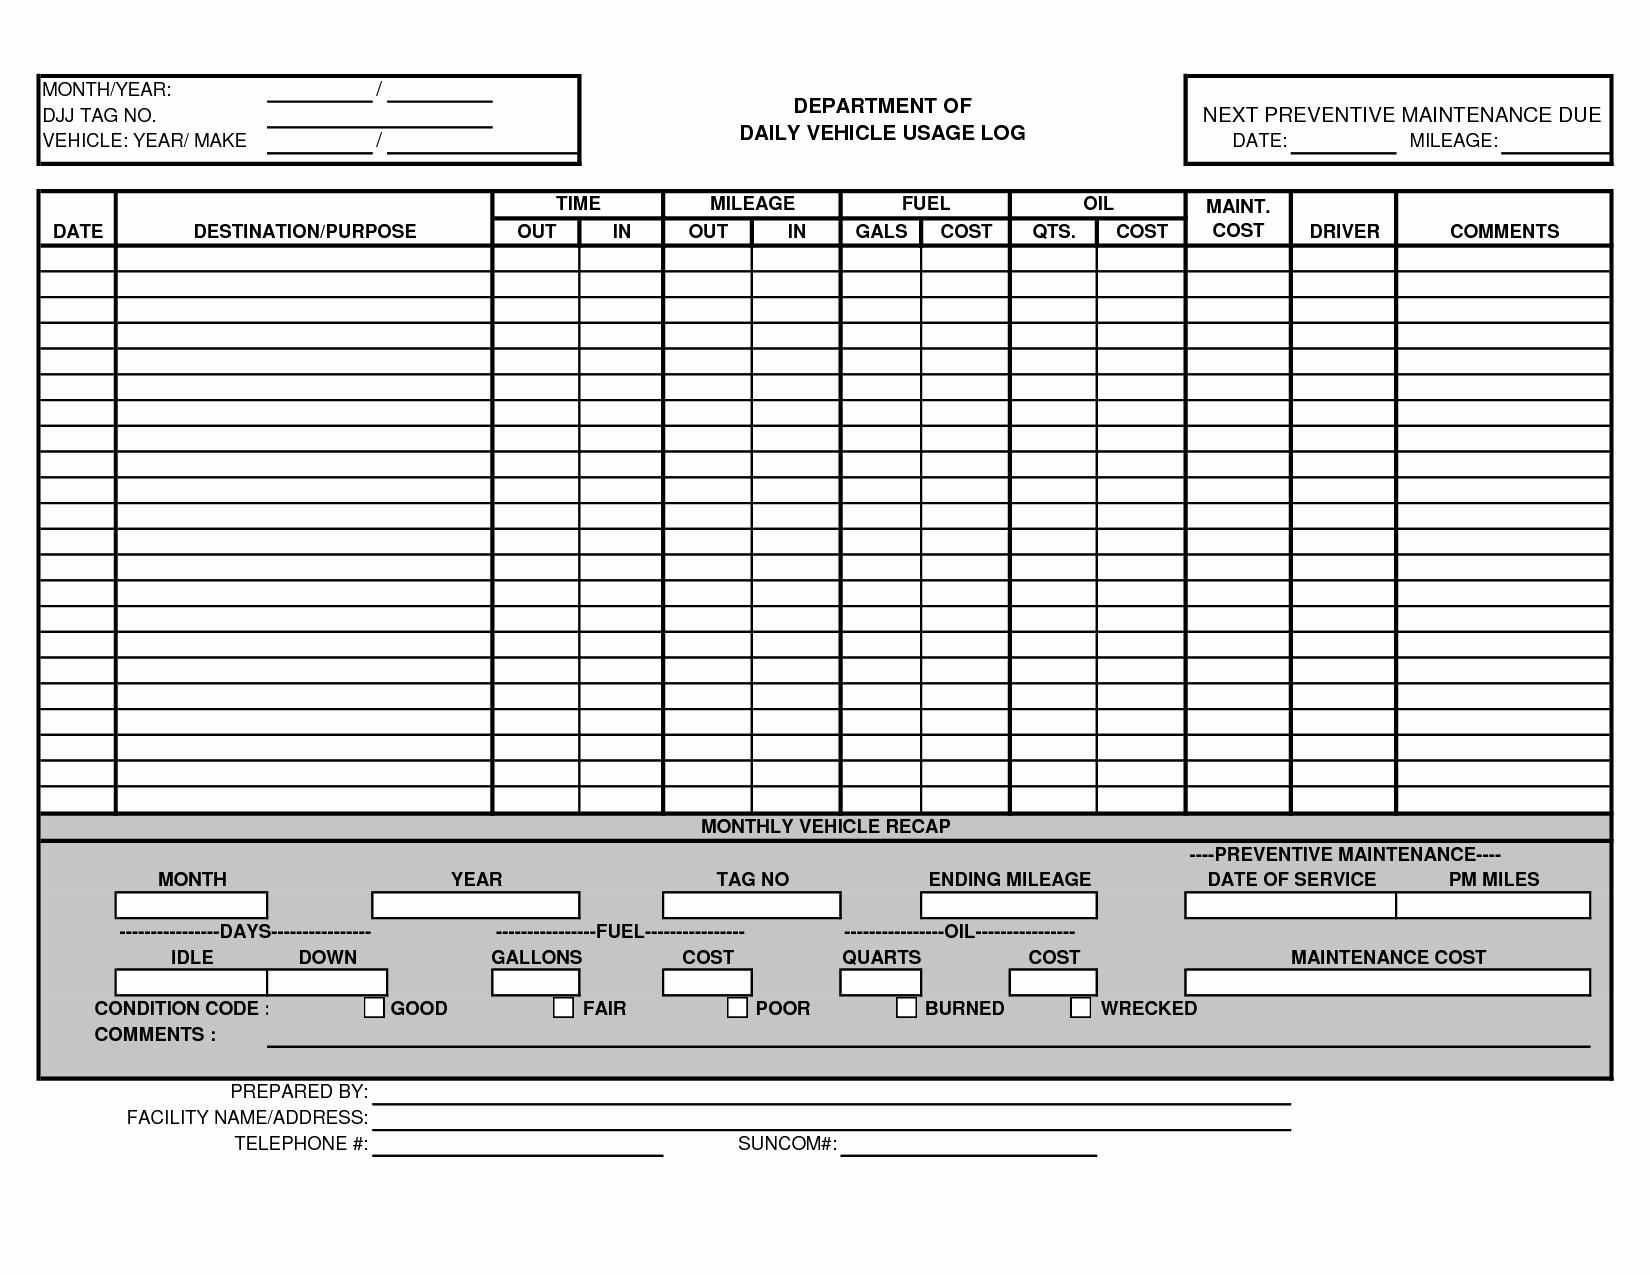 Vehicle Maintenance Schedule Template Excel Awesome Vehicle Maintenance Schedule Template Excel – Printable